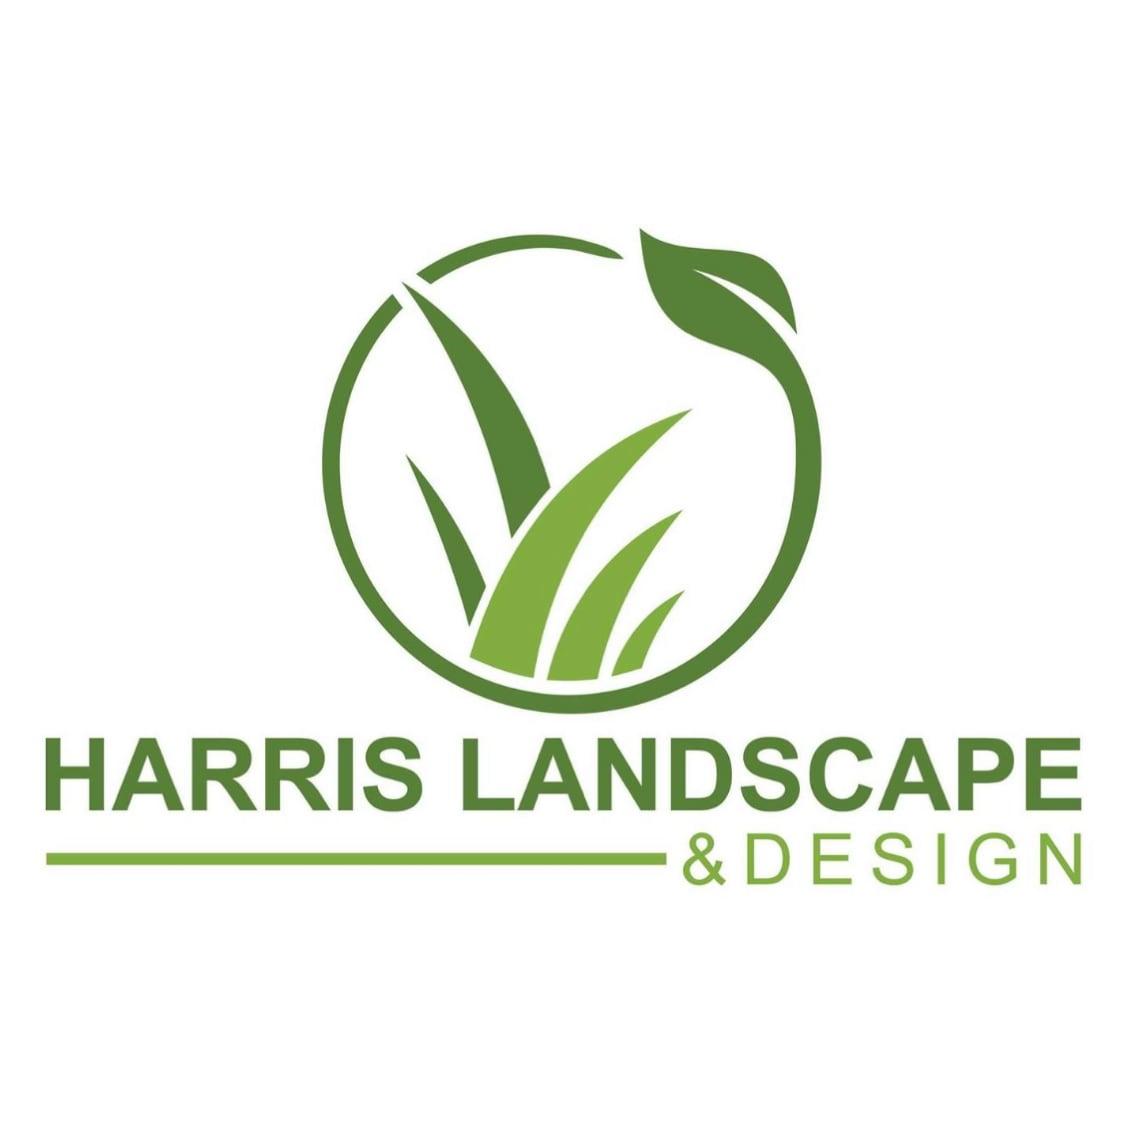 Harris Landscape & Design